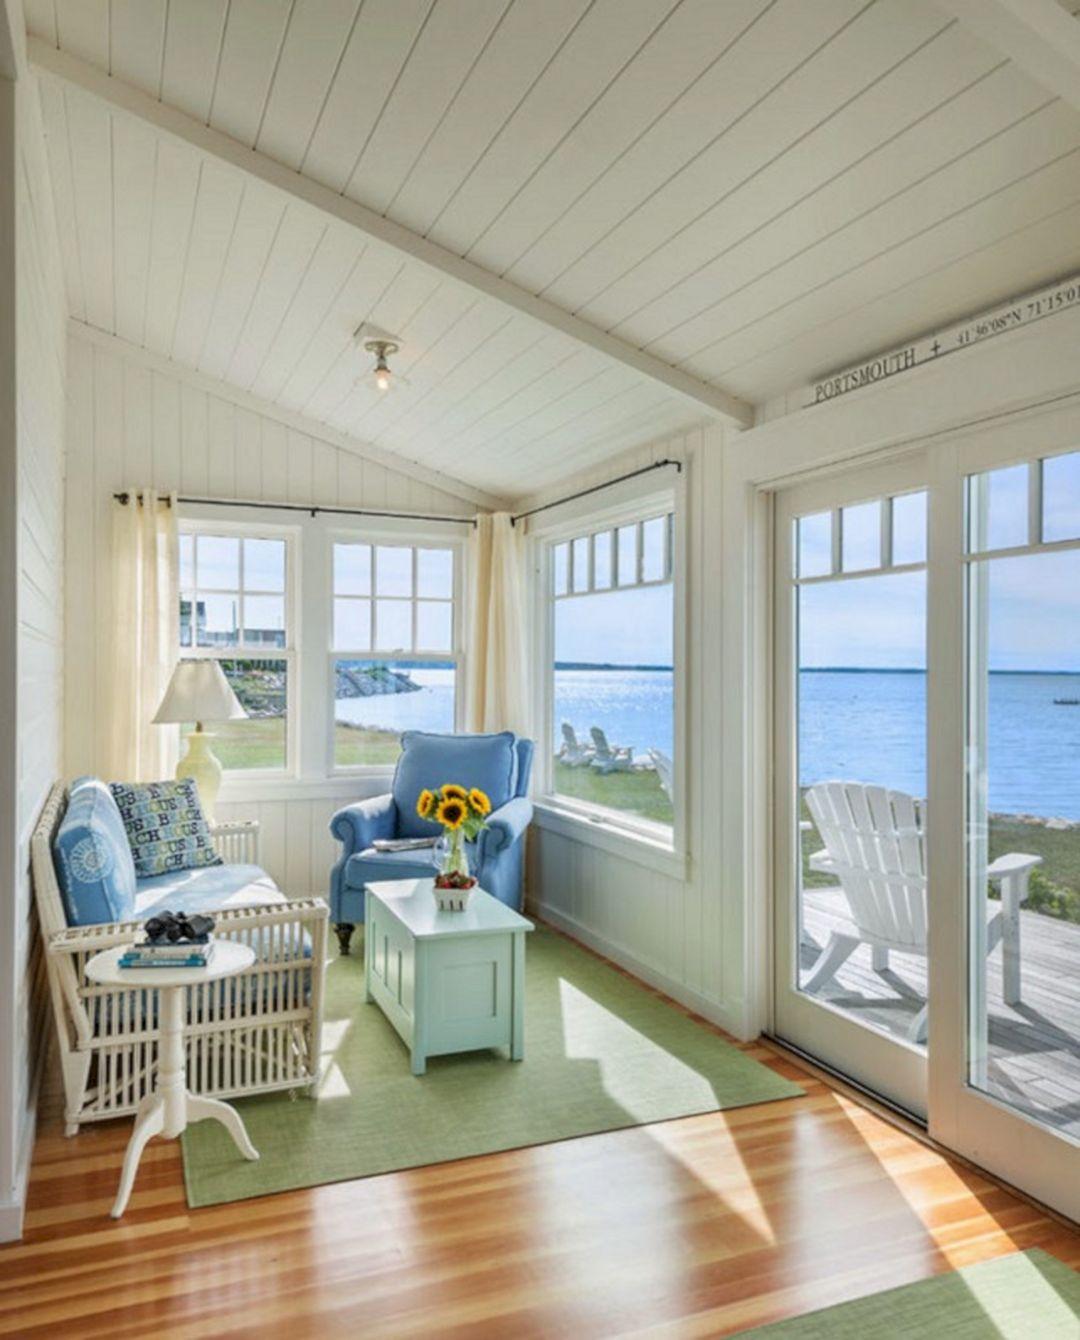 Beach Cottage Interior Design For Amazing Home inspiration 9